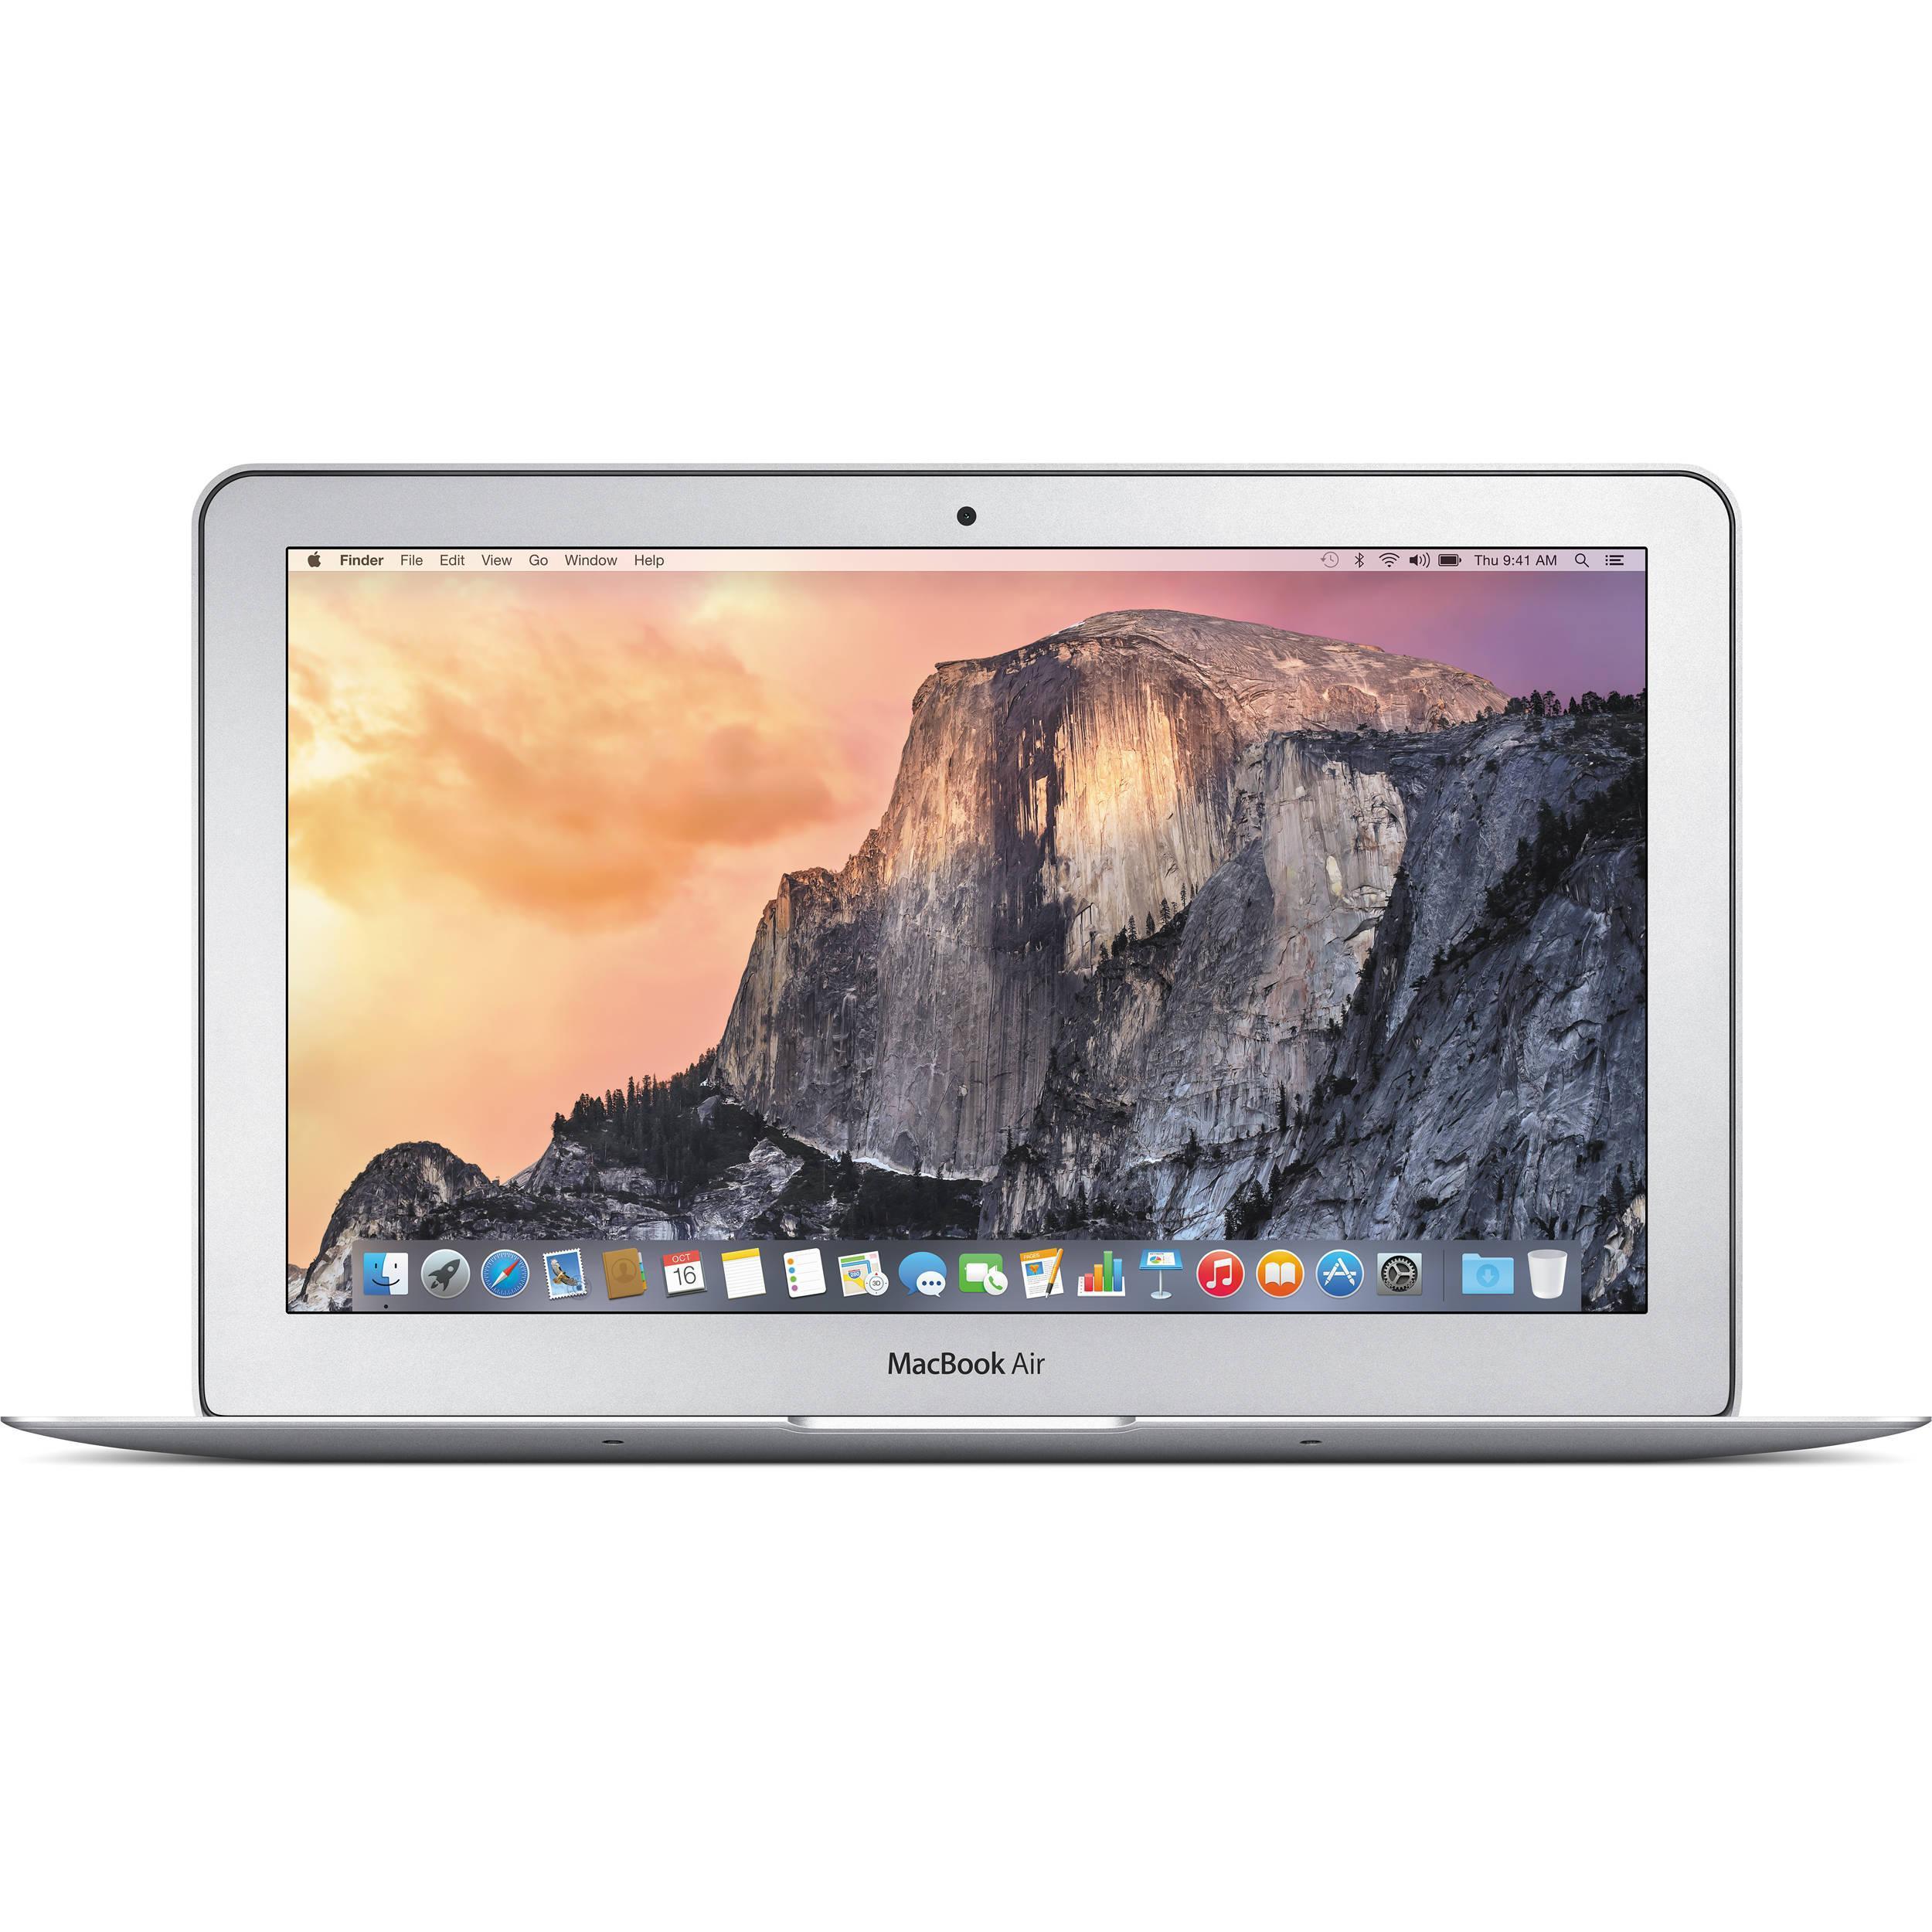 MacBook Air 11,6-tum (2015) - Core i7 - 4GB - SSD 128 GB AZERTY - Fransk